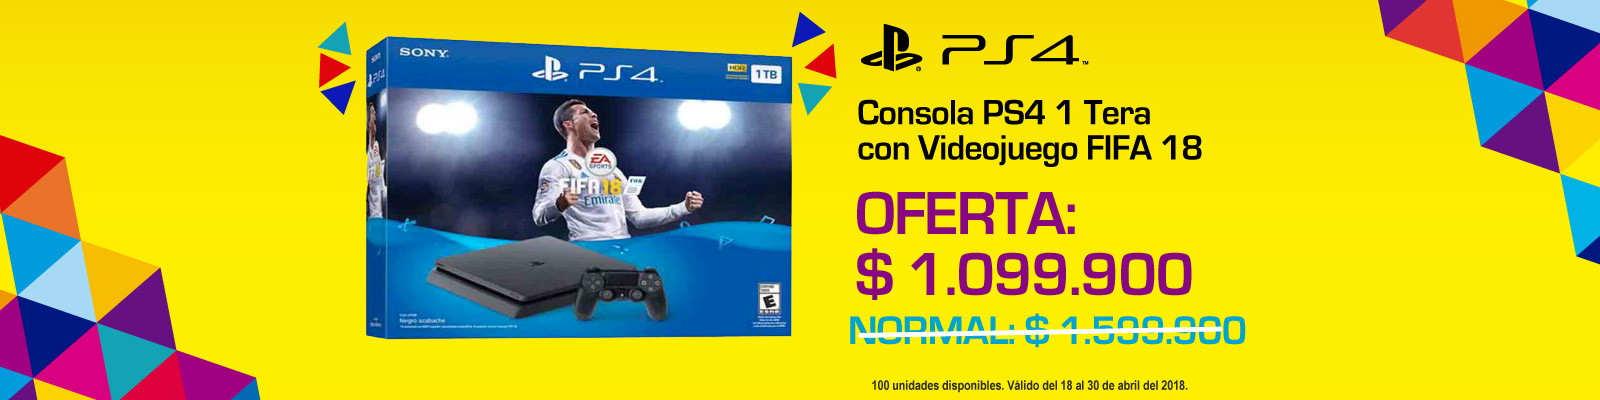 TOP PROMO ALKP-1-videojuegos-Consola PS4 1 Tera con Videojuego FIFA 18-prod-Abril18-20